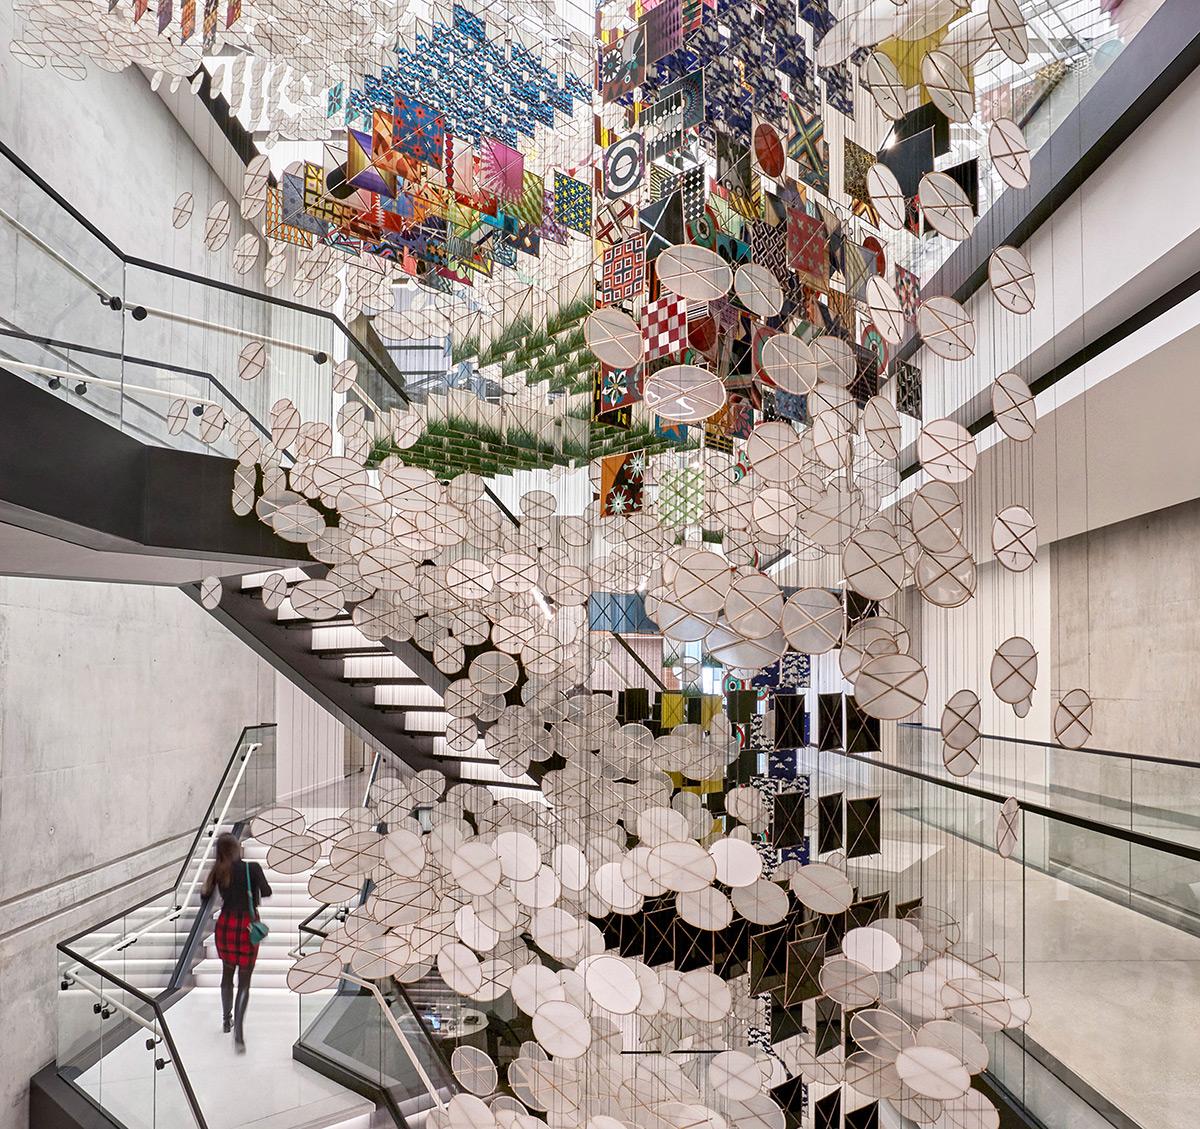 mcdonalds-hq-ia-interior-architects-studio-o-a-06